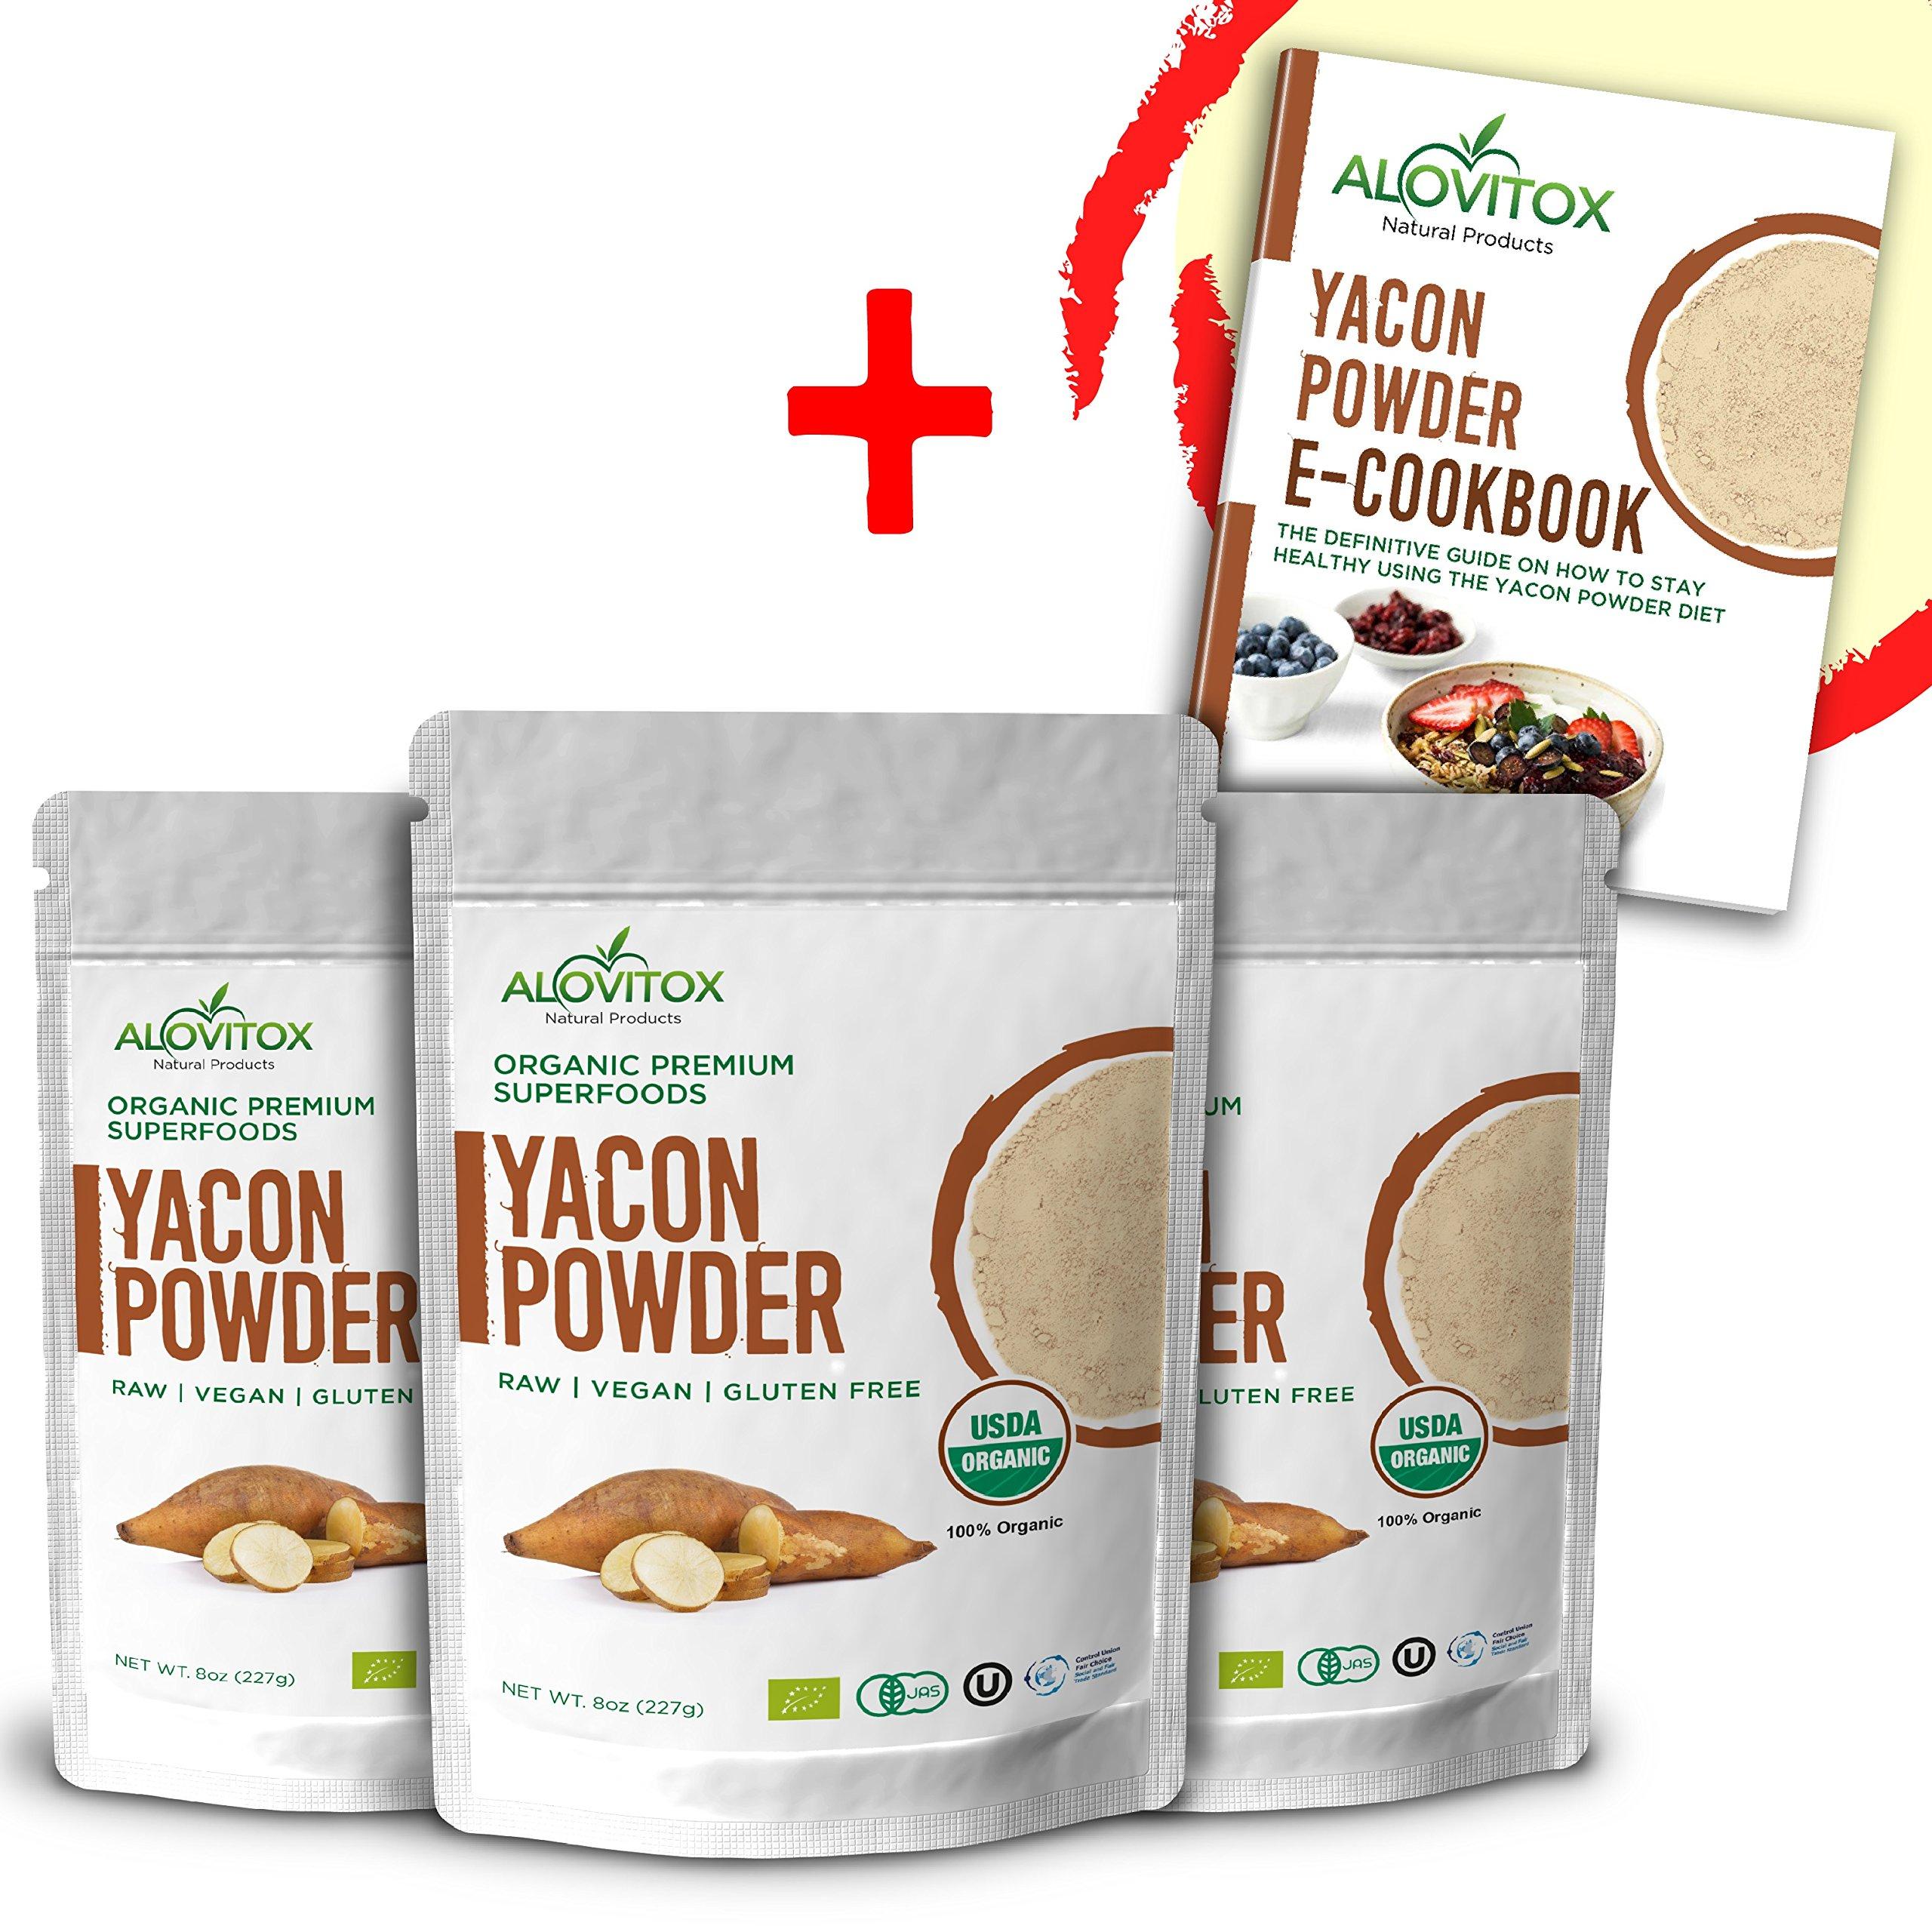 Yacon Root Powder Natural Sweetener - Sugar Substitute Sugar-Free Keto Paleo and Vegan - Wellness and Weightloss Prebiotic Diet Friendly Pure Raw Plant Extract - USDA Organic 8oz by Alovitox (3 Pack)